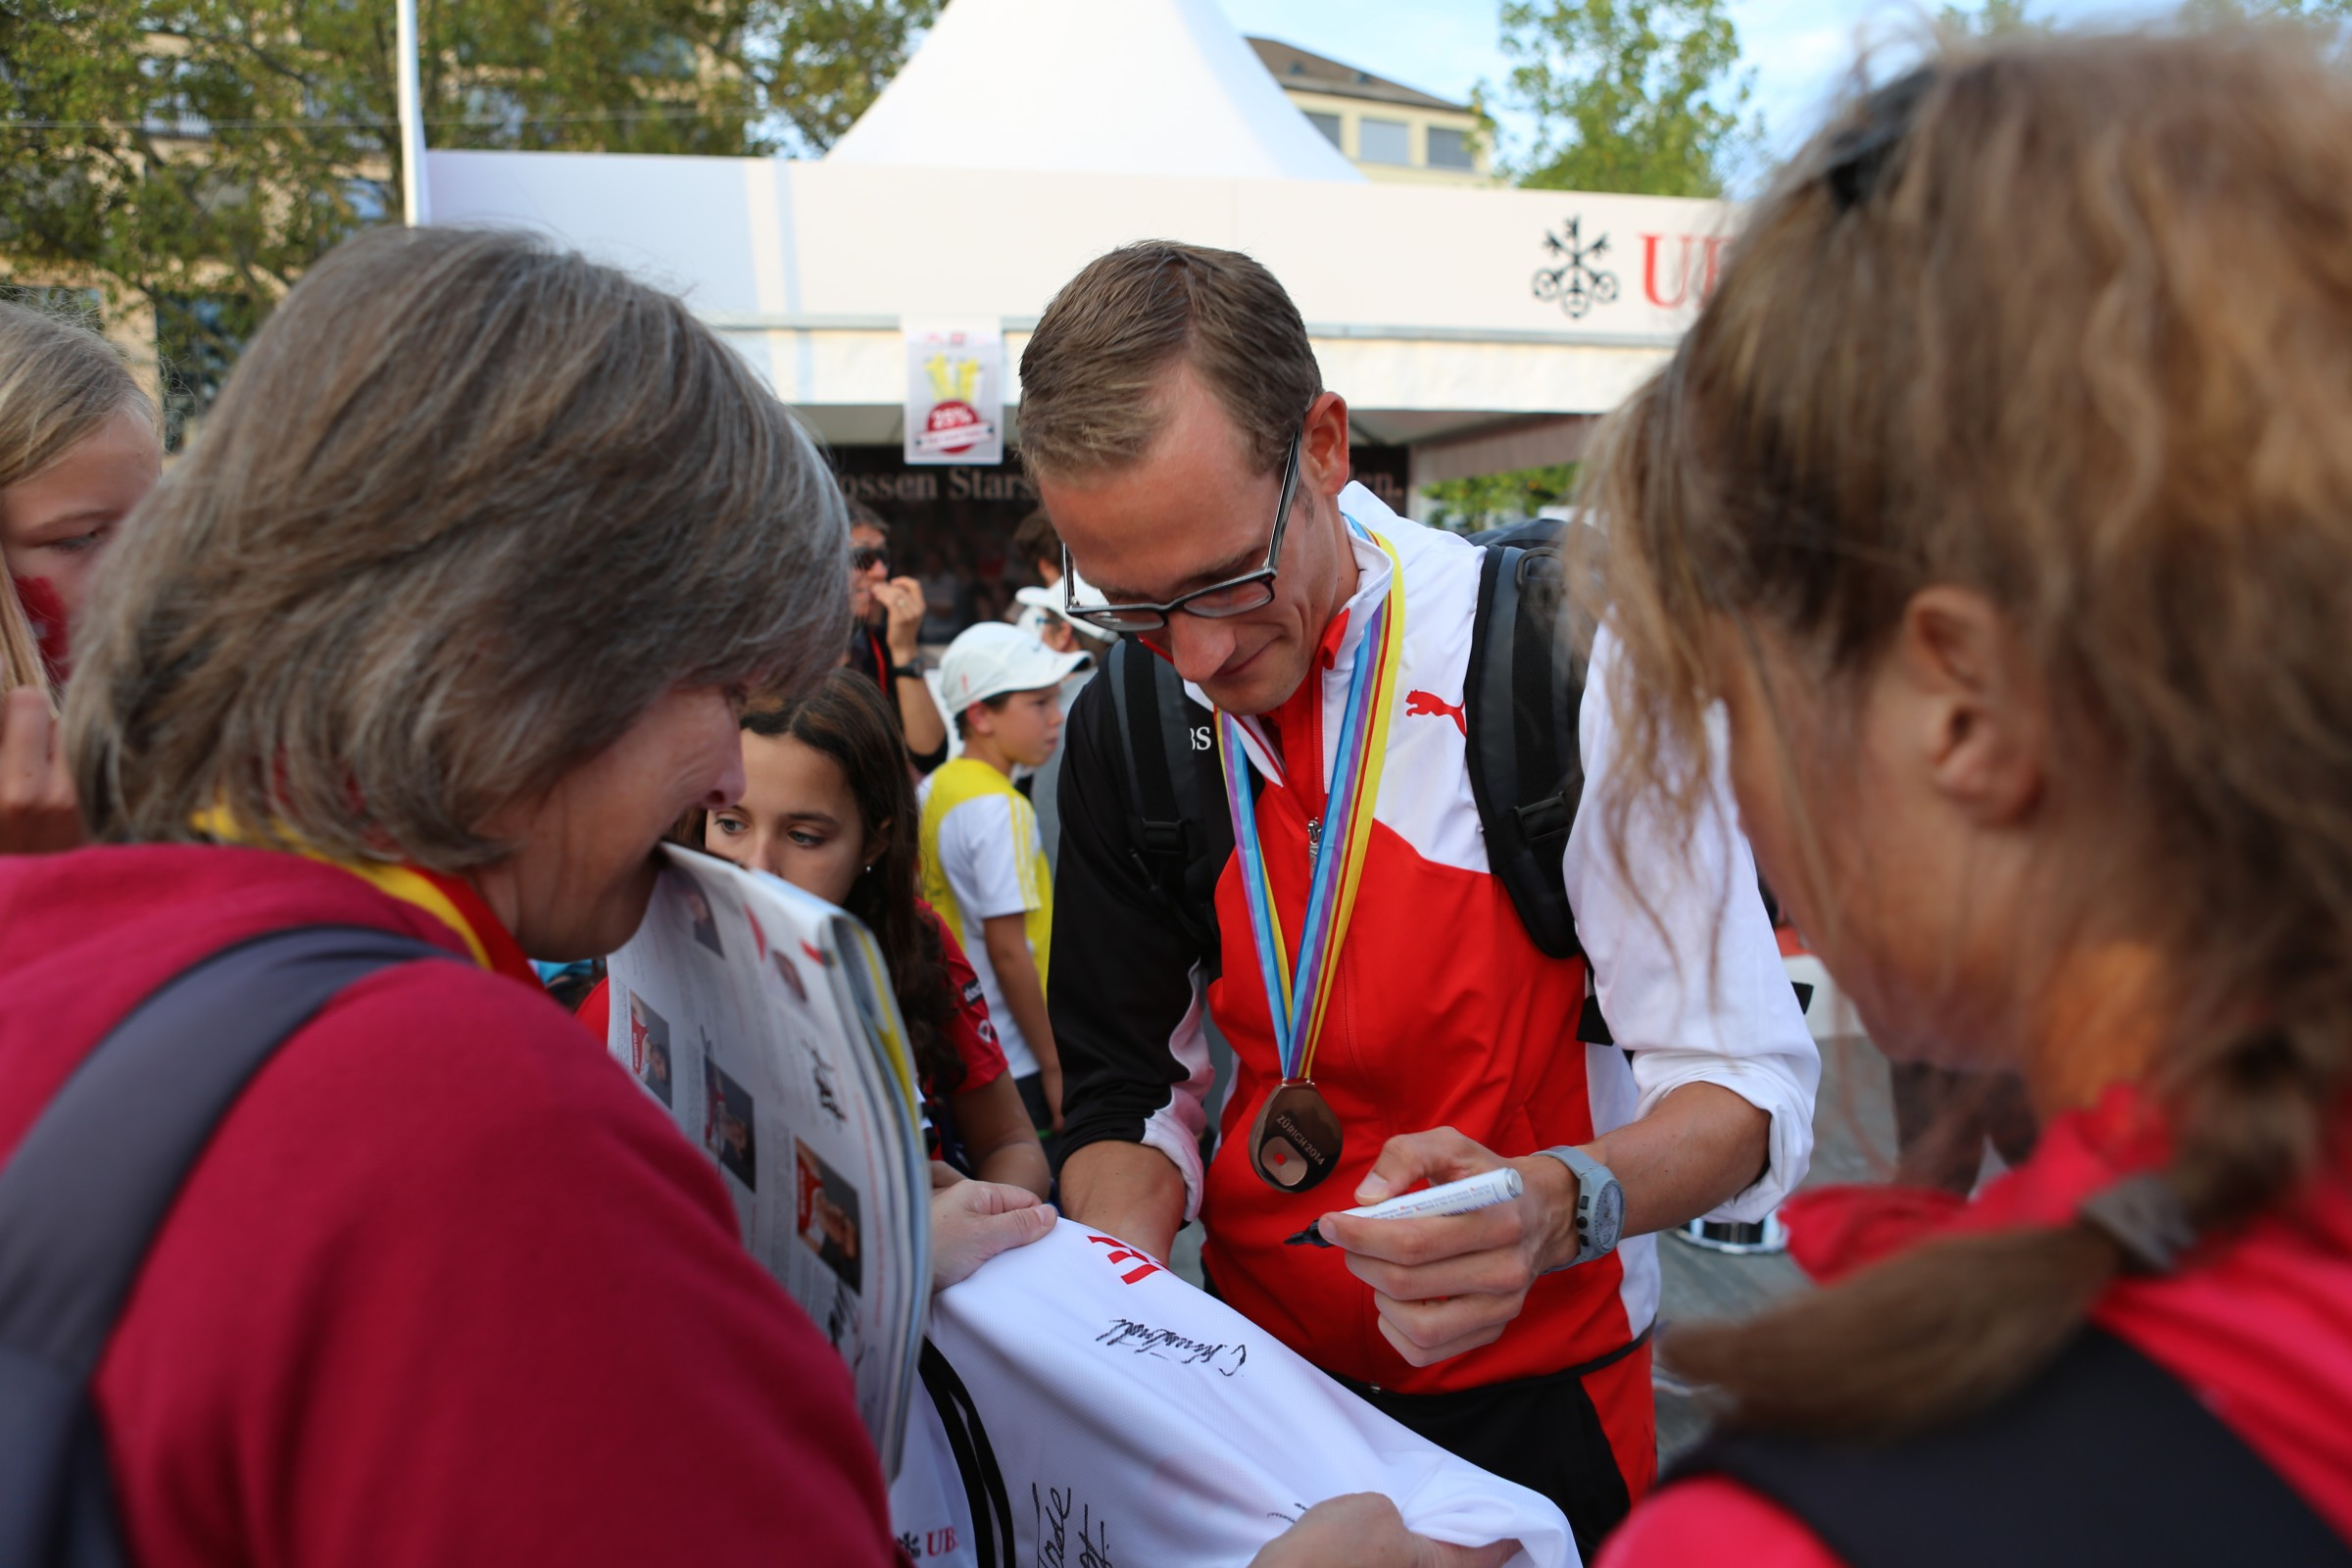 Leichtathletik-EM 2014, 17. August 2014 (Bild: Matthias Kreienbühl)